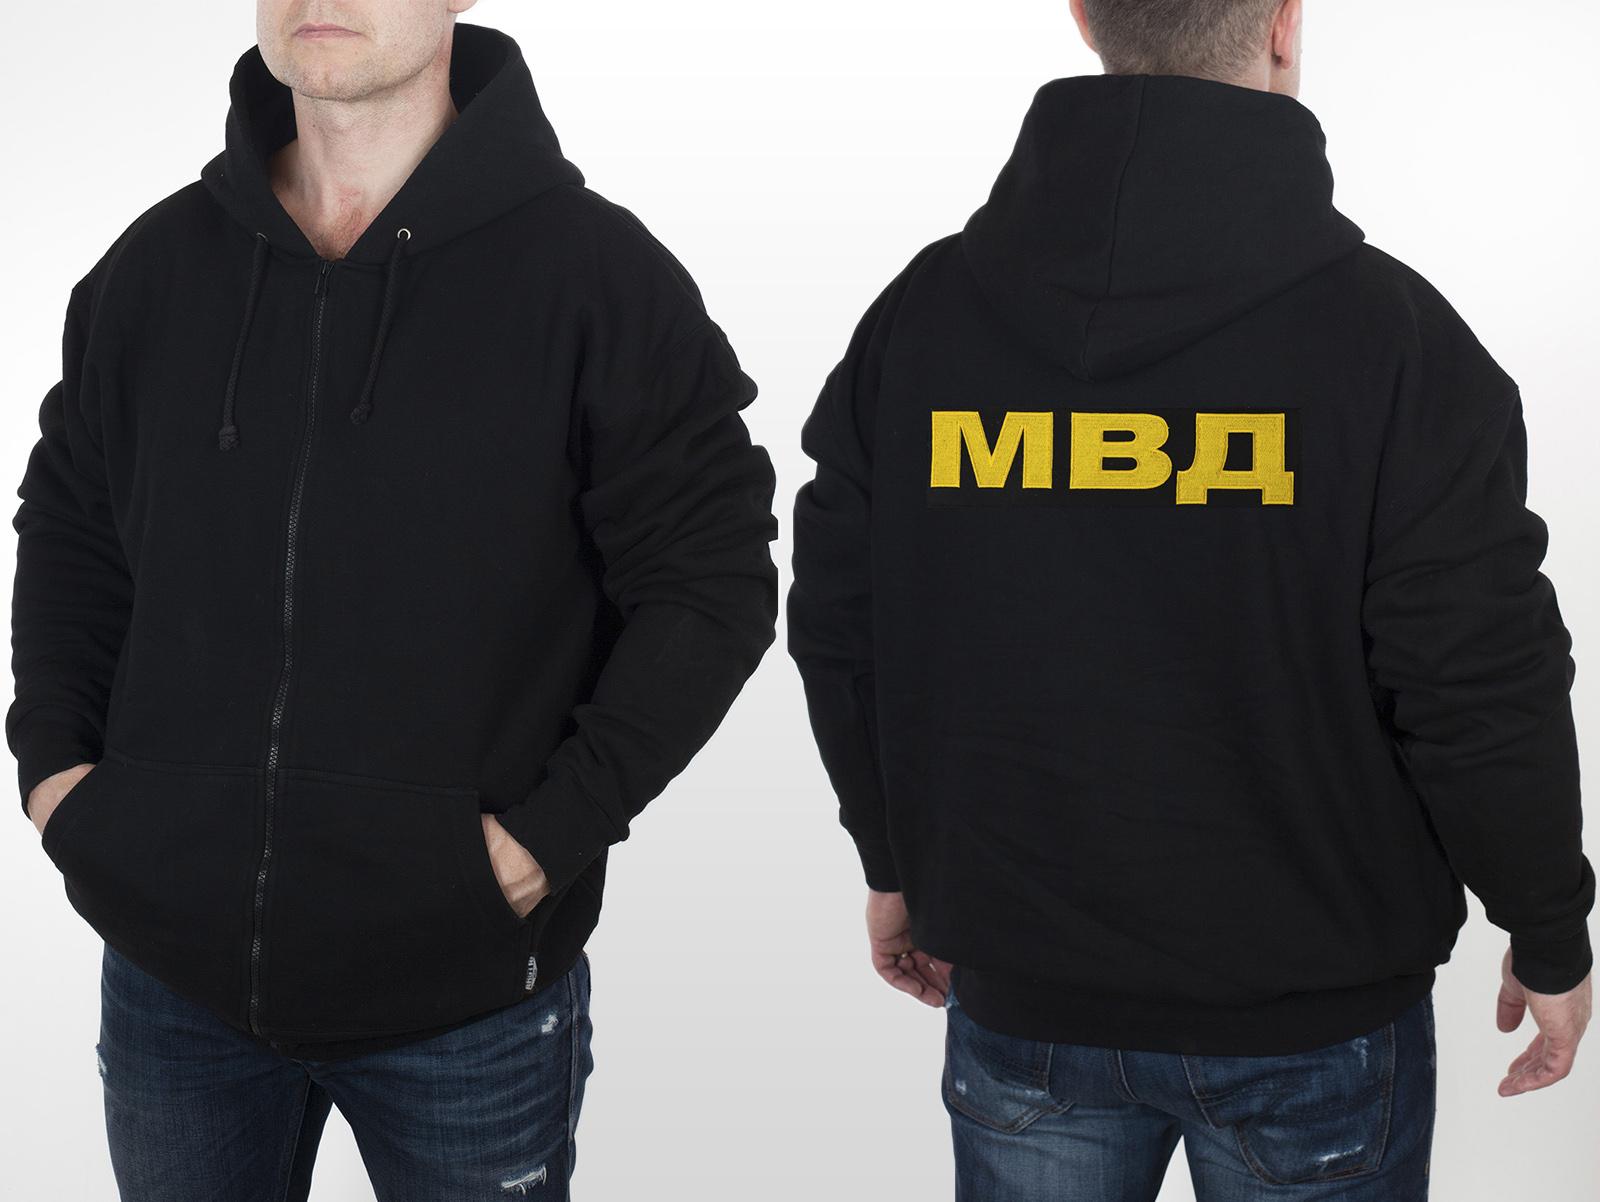 Статусная мужская кофта-толстовка МВД